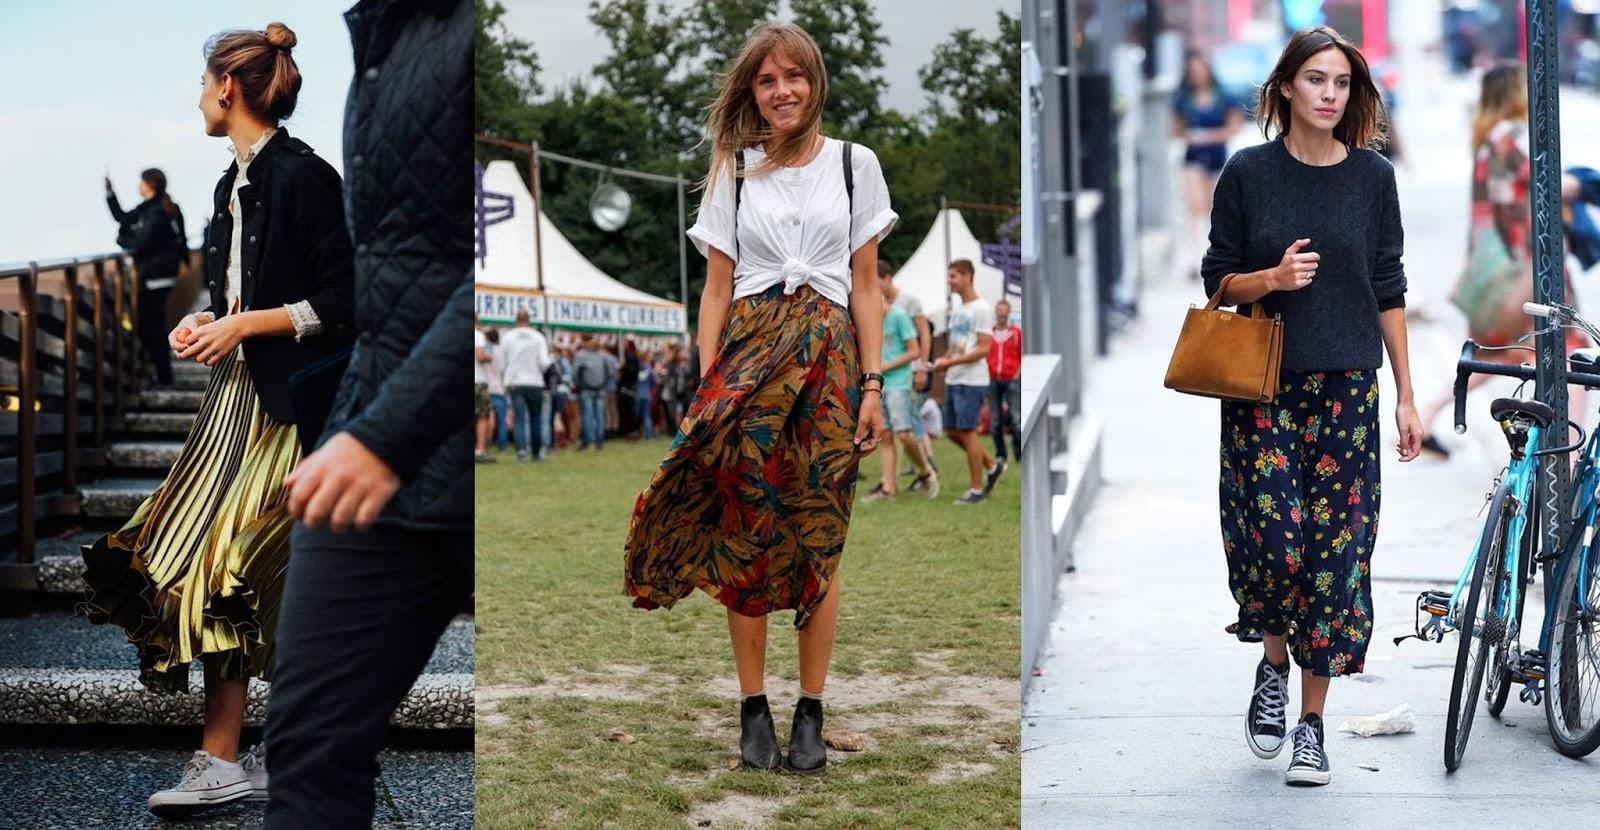 pleated skirt inspiration from pinterest